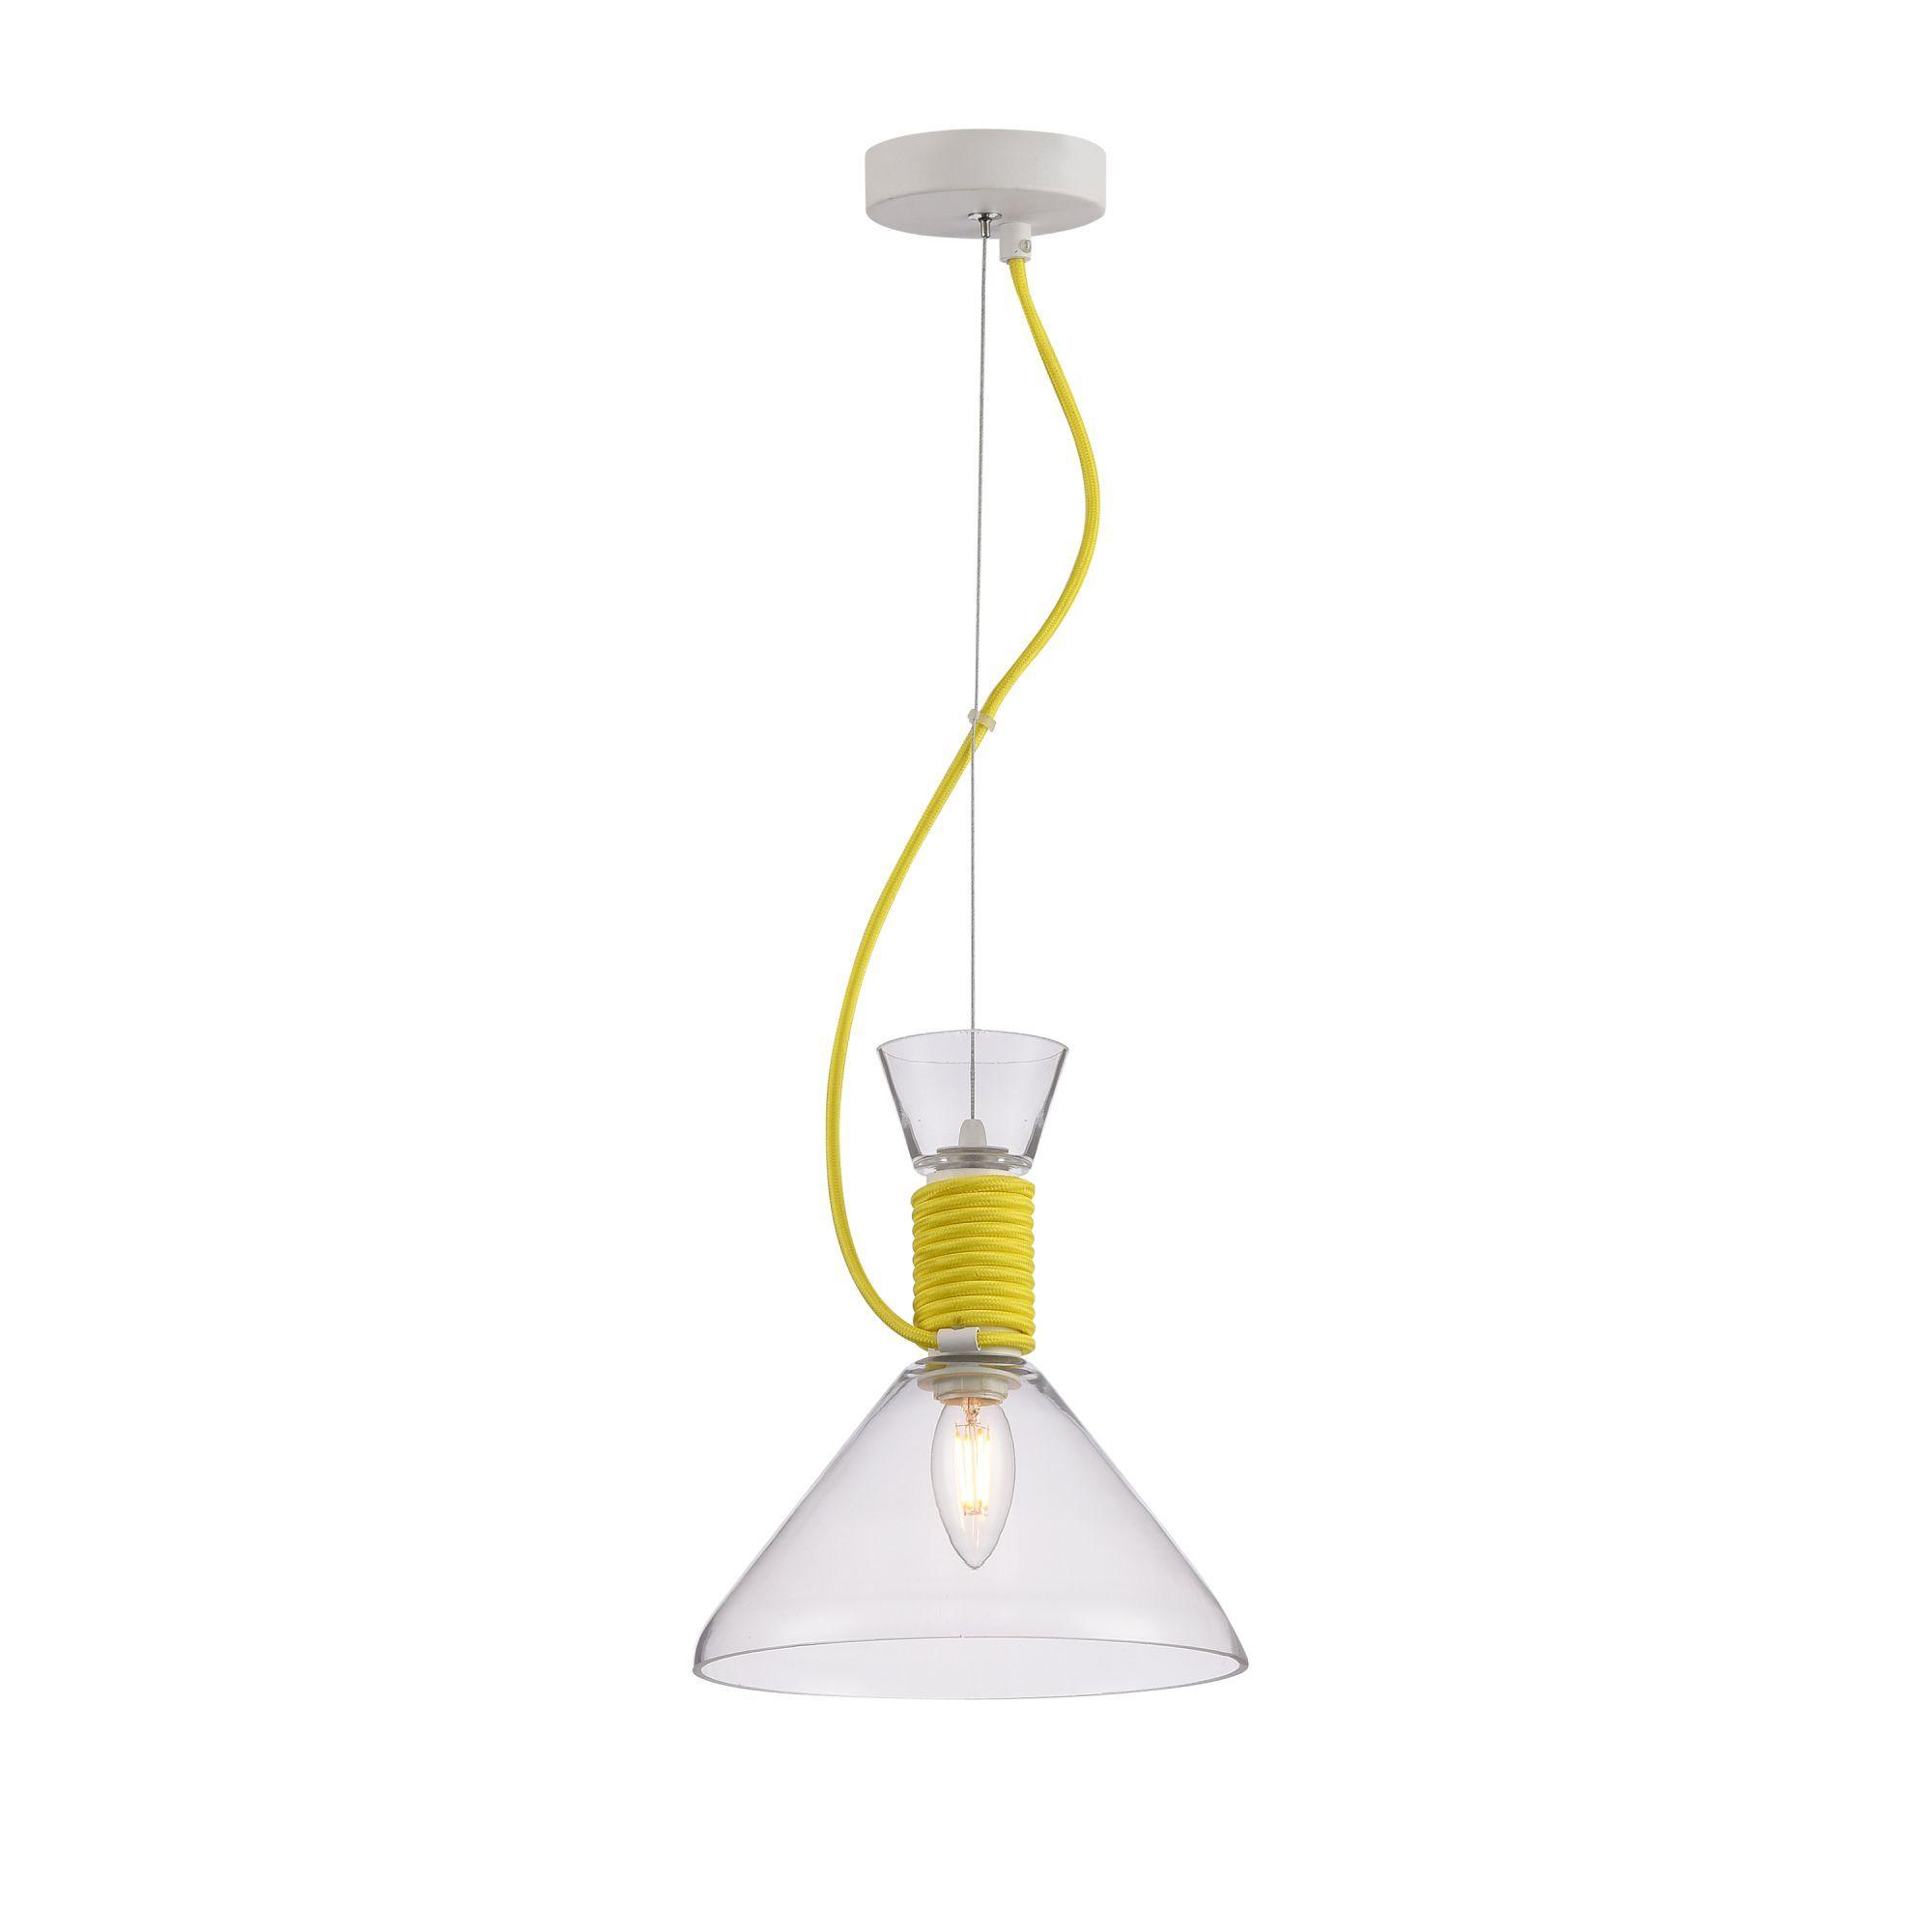 Подвесной светильник Maytoni Modern California P536PL-01YW, 1xE14x40W, белый, желтый, прозрачный, металл, стекло - фото 1